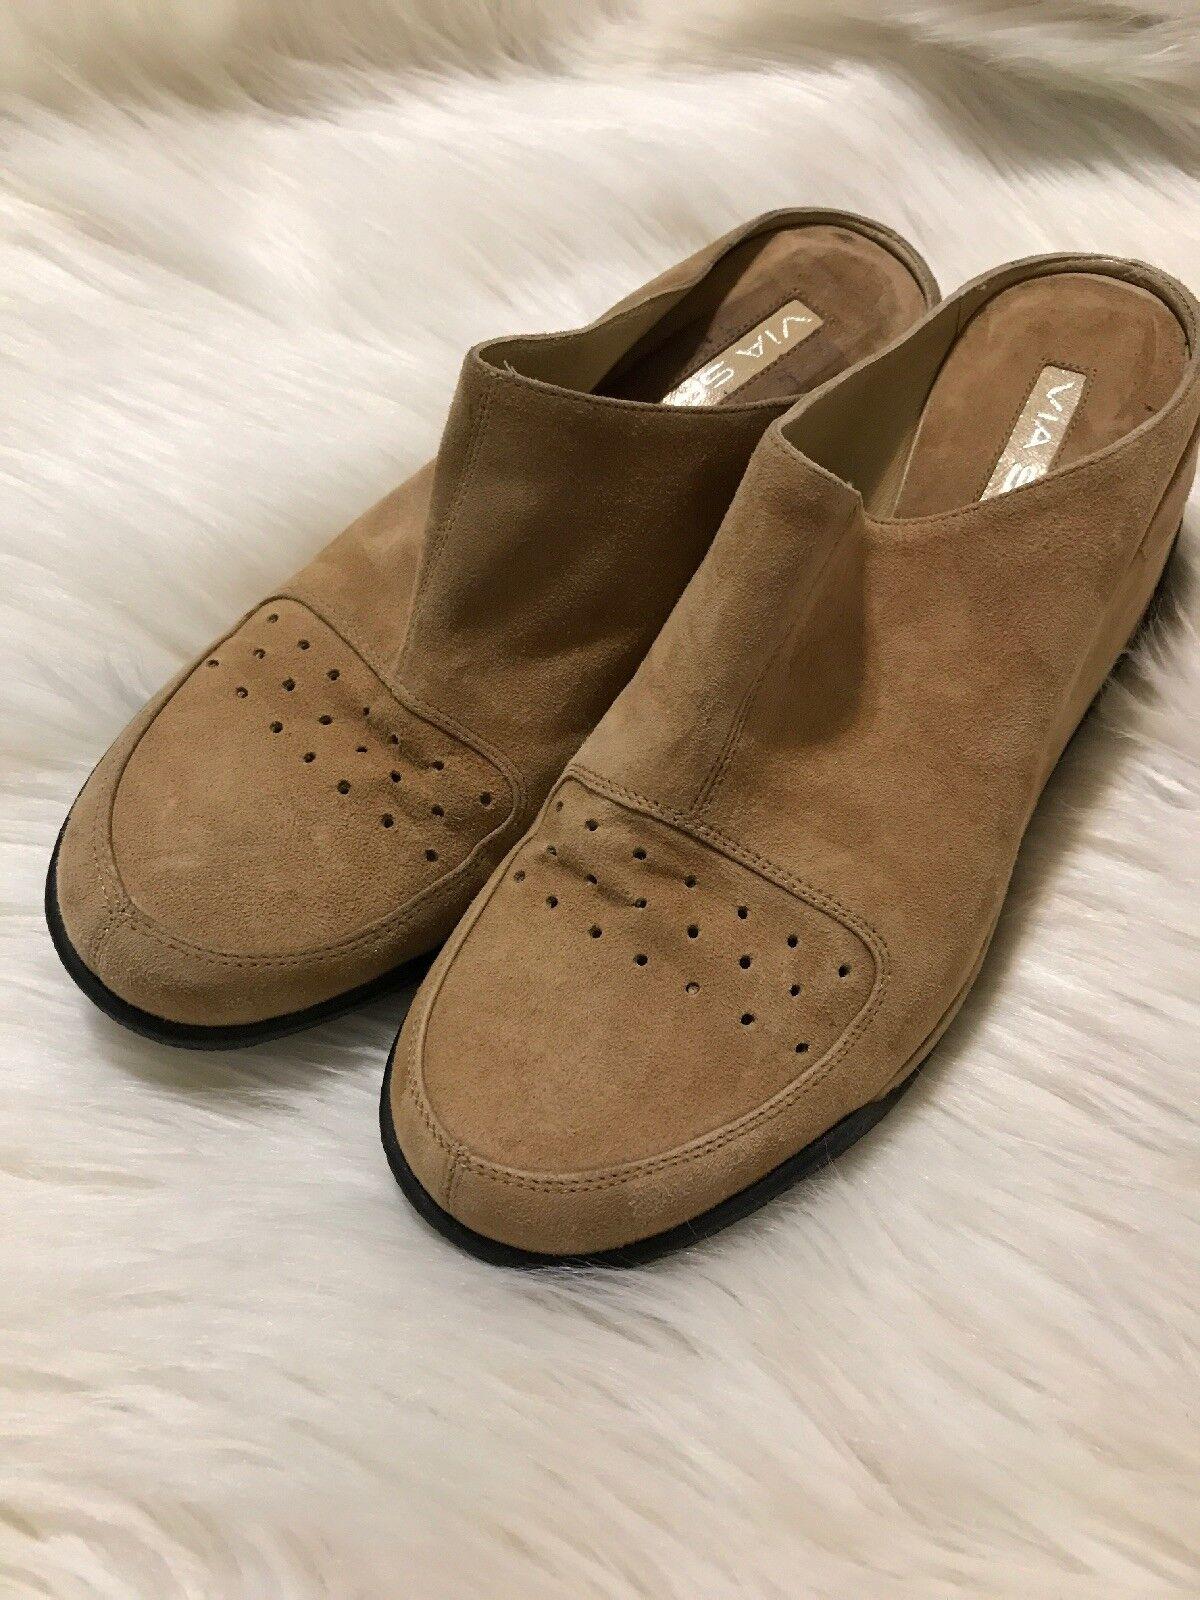 Via Spiga Tan Suede Slip-on Mules Wedge shoes Heels  Sz 8.5 Casual